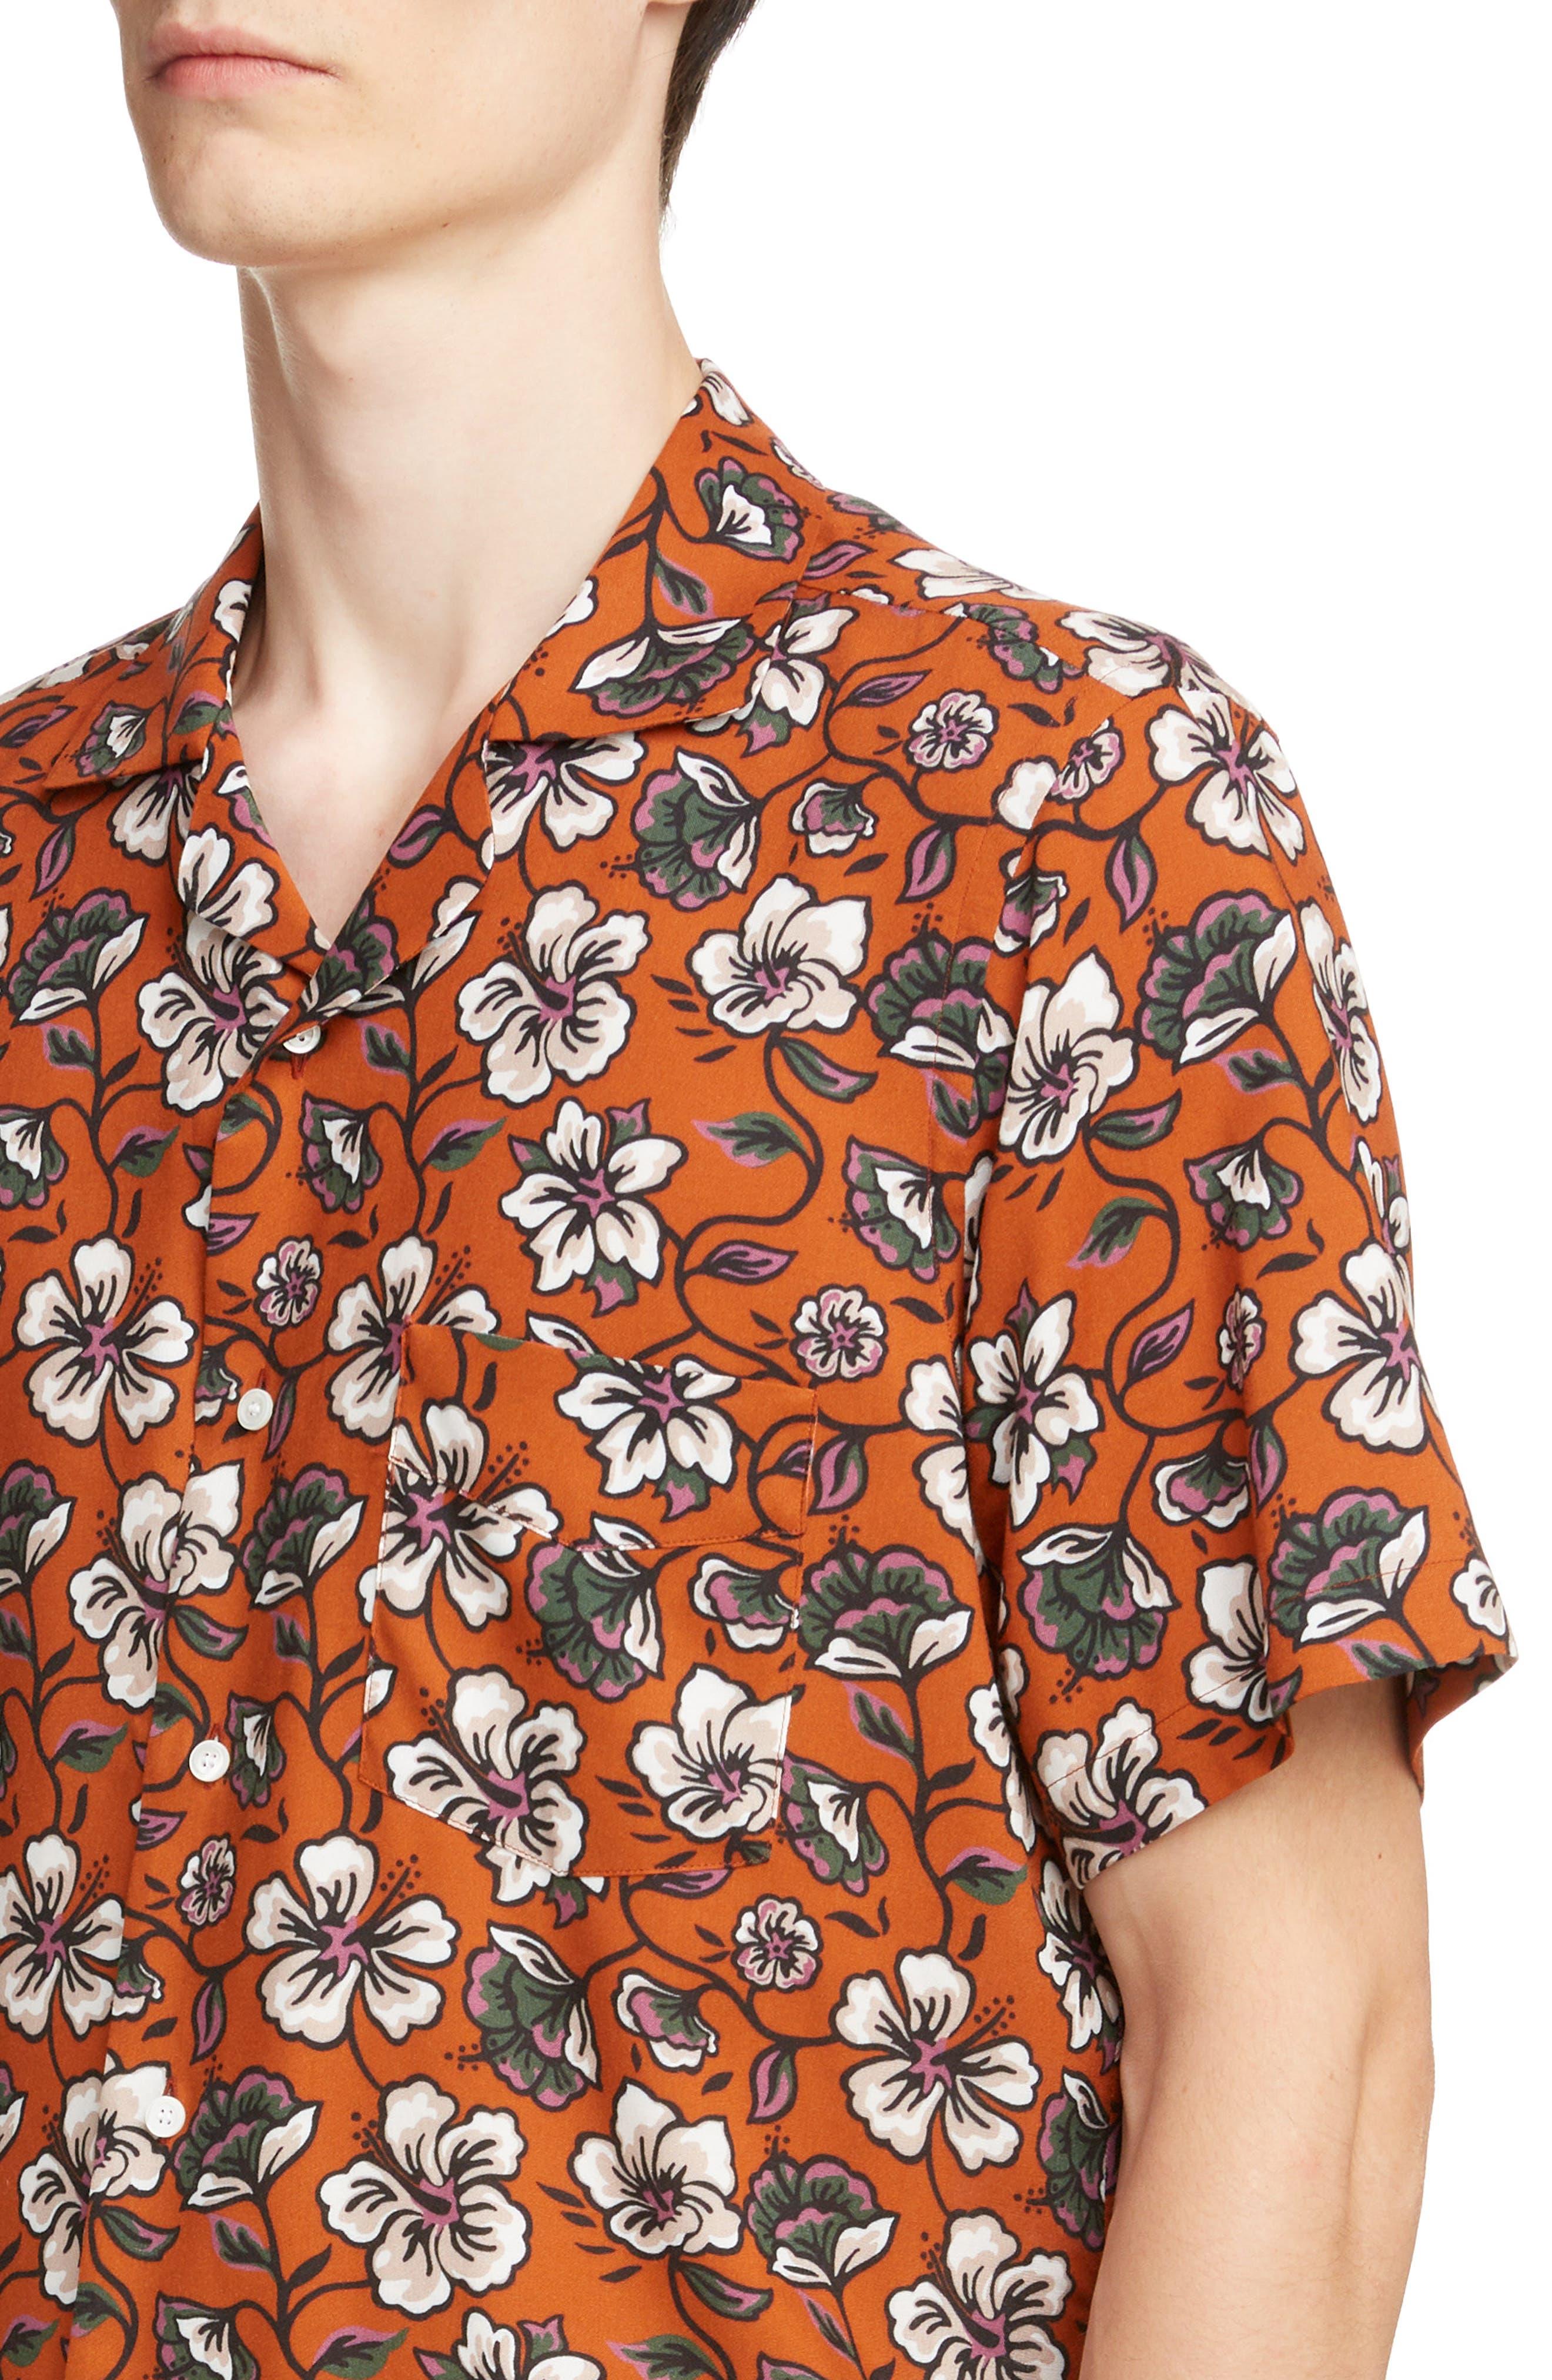 LOEWE,                             Floral Print Camp Shirt,                             Alternate thumbnail 2, color,                             2103-WHITE/ BROWN